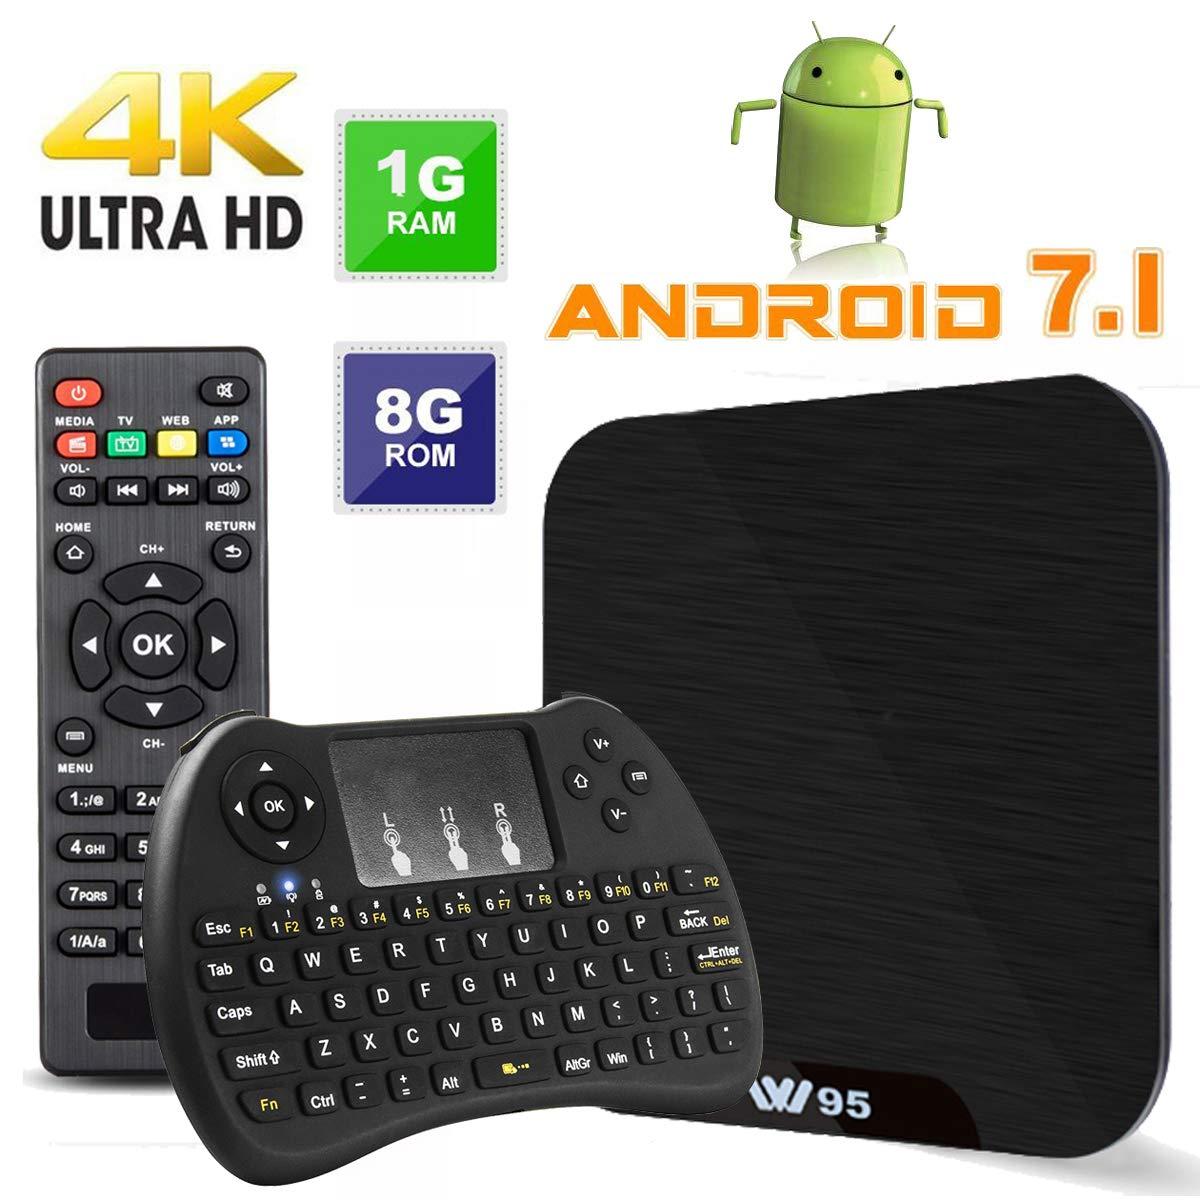 TV Box Android 7.1 - VIDEN W1 Smart TV Box Amlogic S905X Quad Core, 1GB RAM &